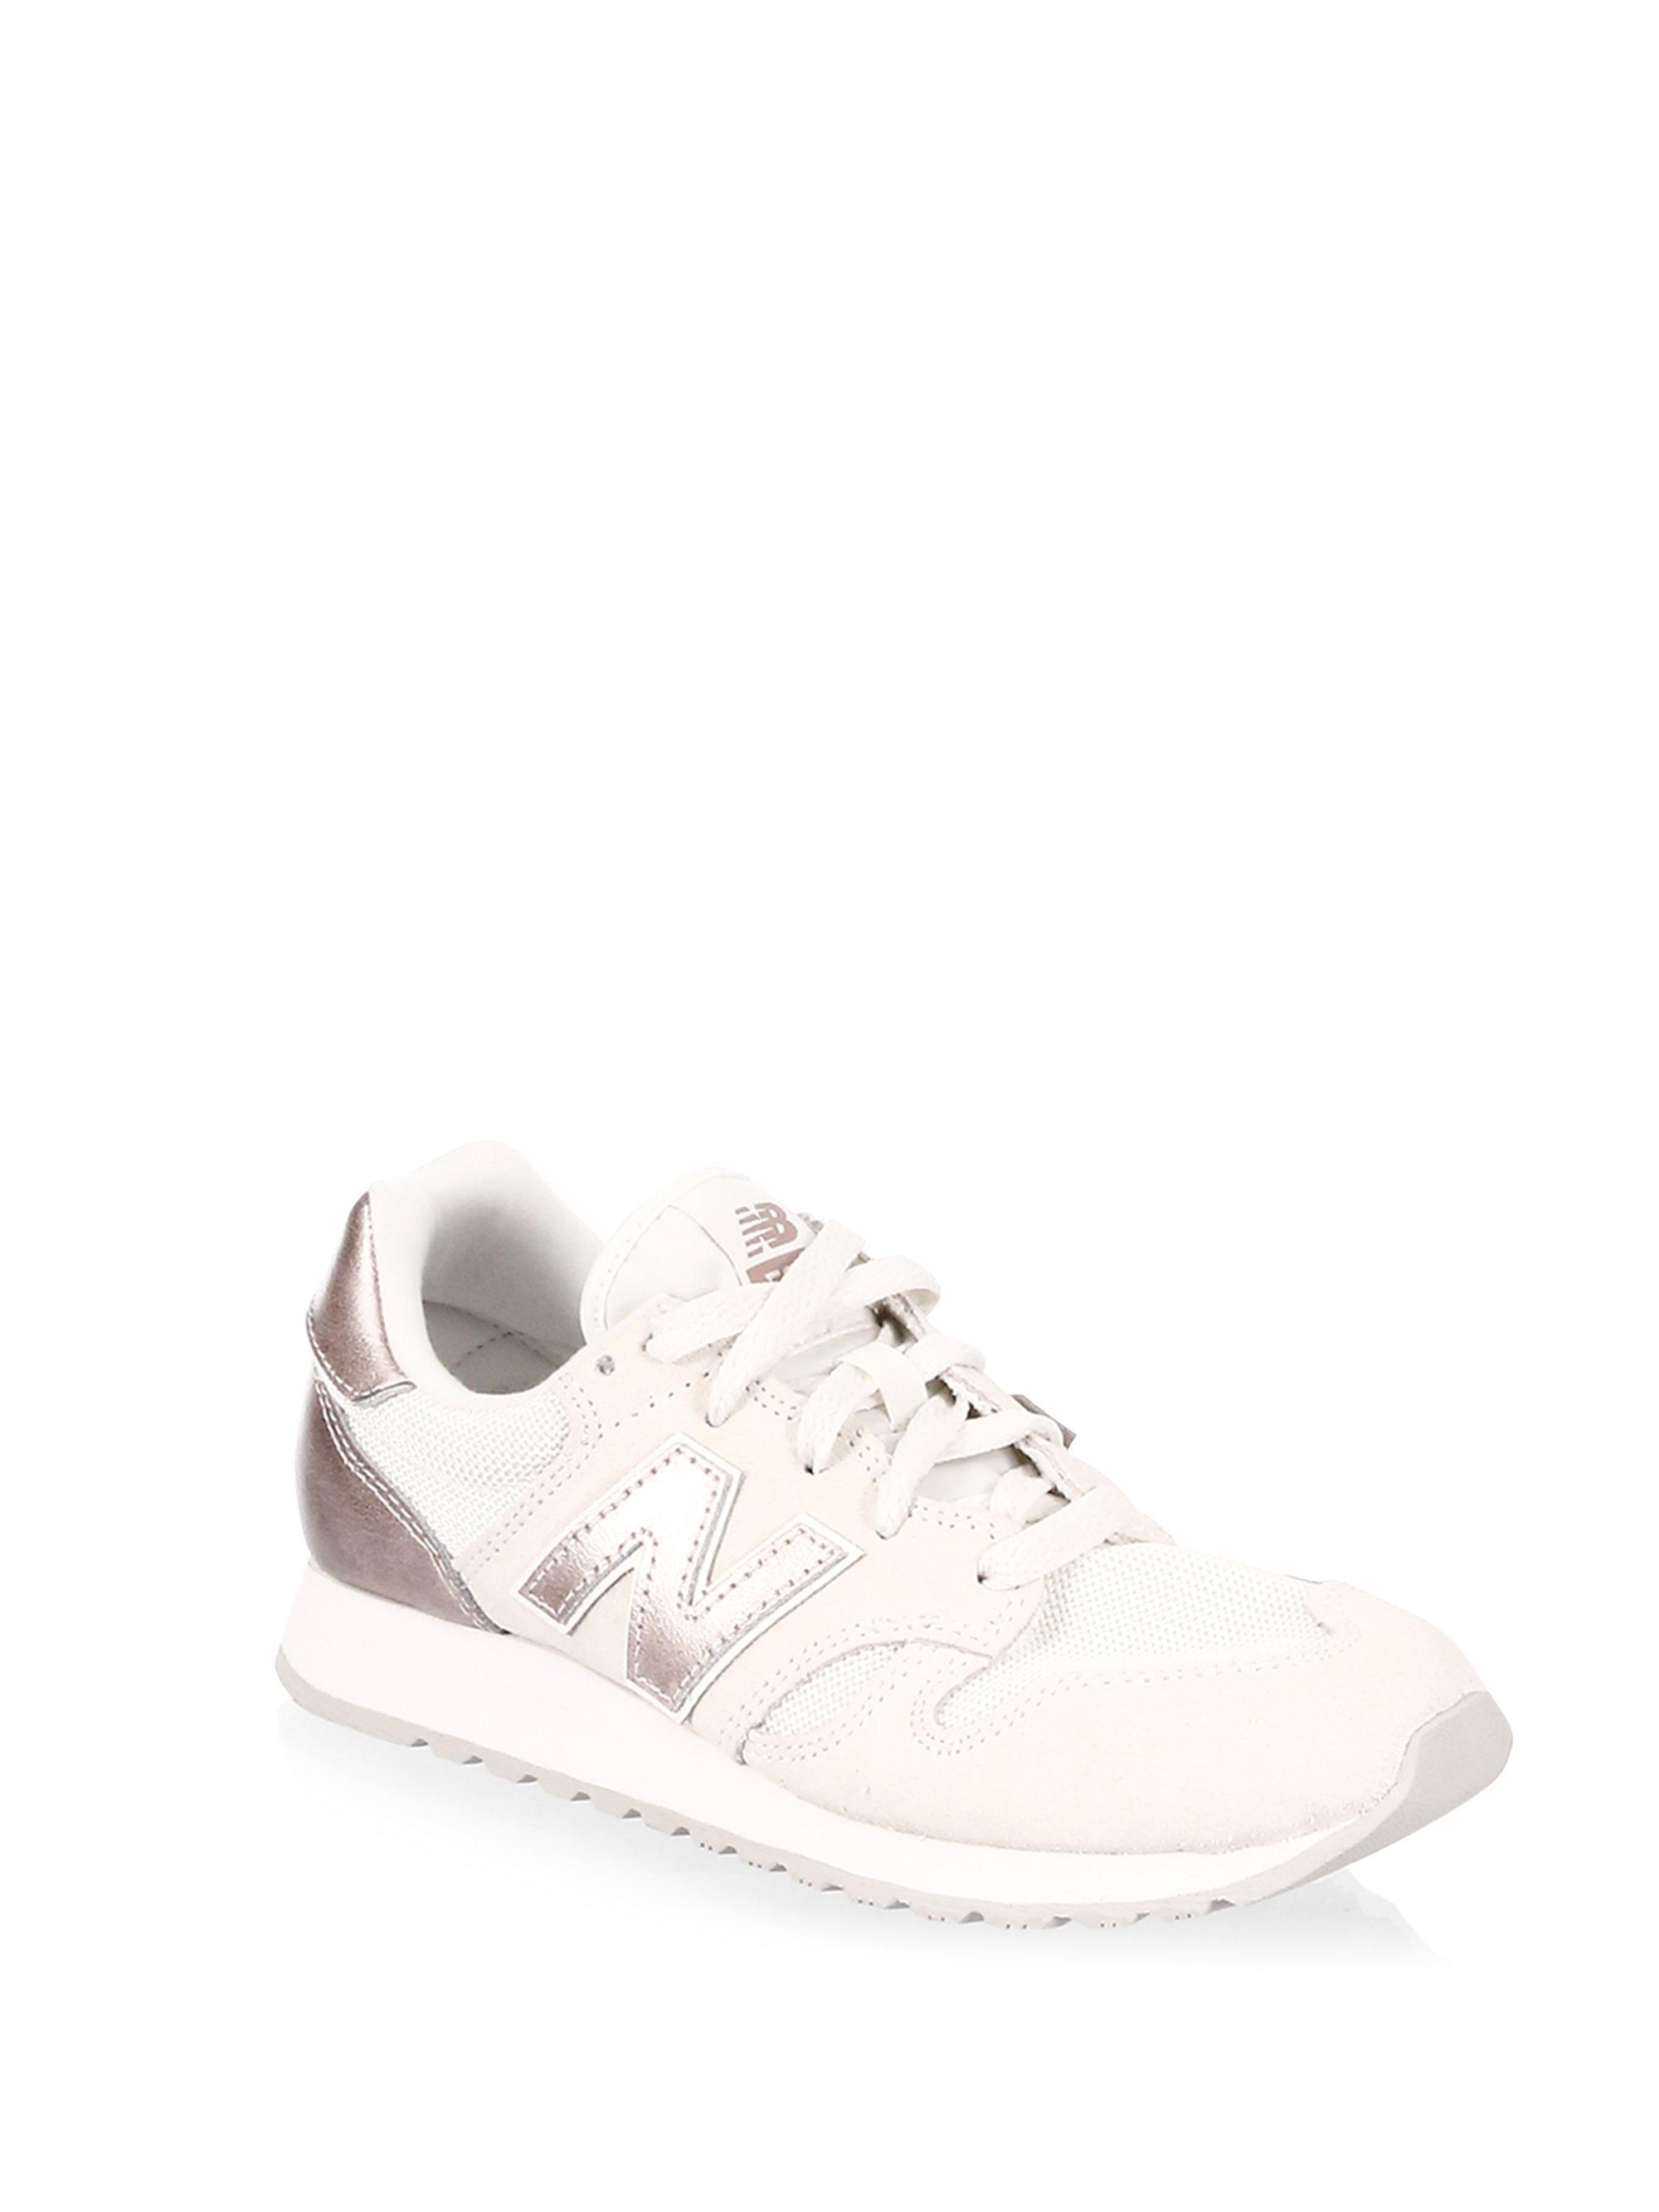 Sale Best 520 METALLIC - FOOTWEAR - Low-tops & sneakers New Balance Reliable Cheap Online New Sale Online Eju4nwTu